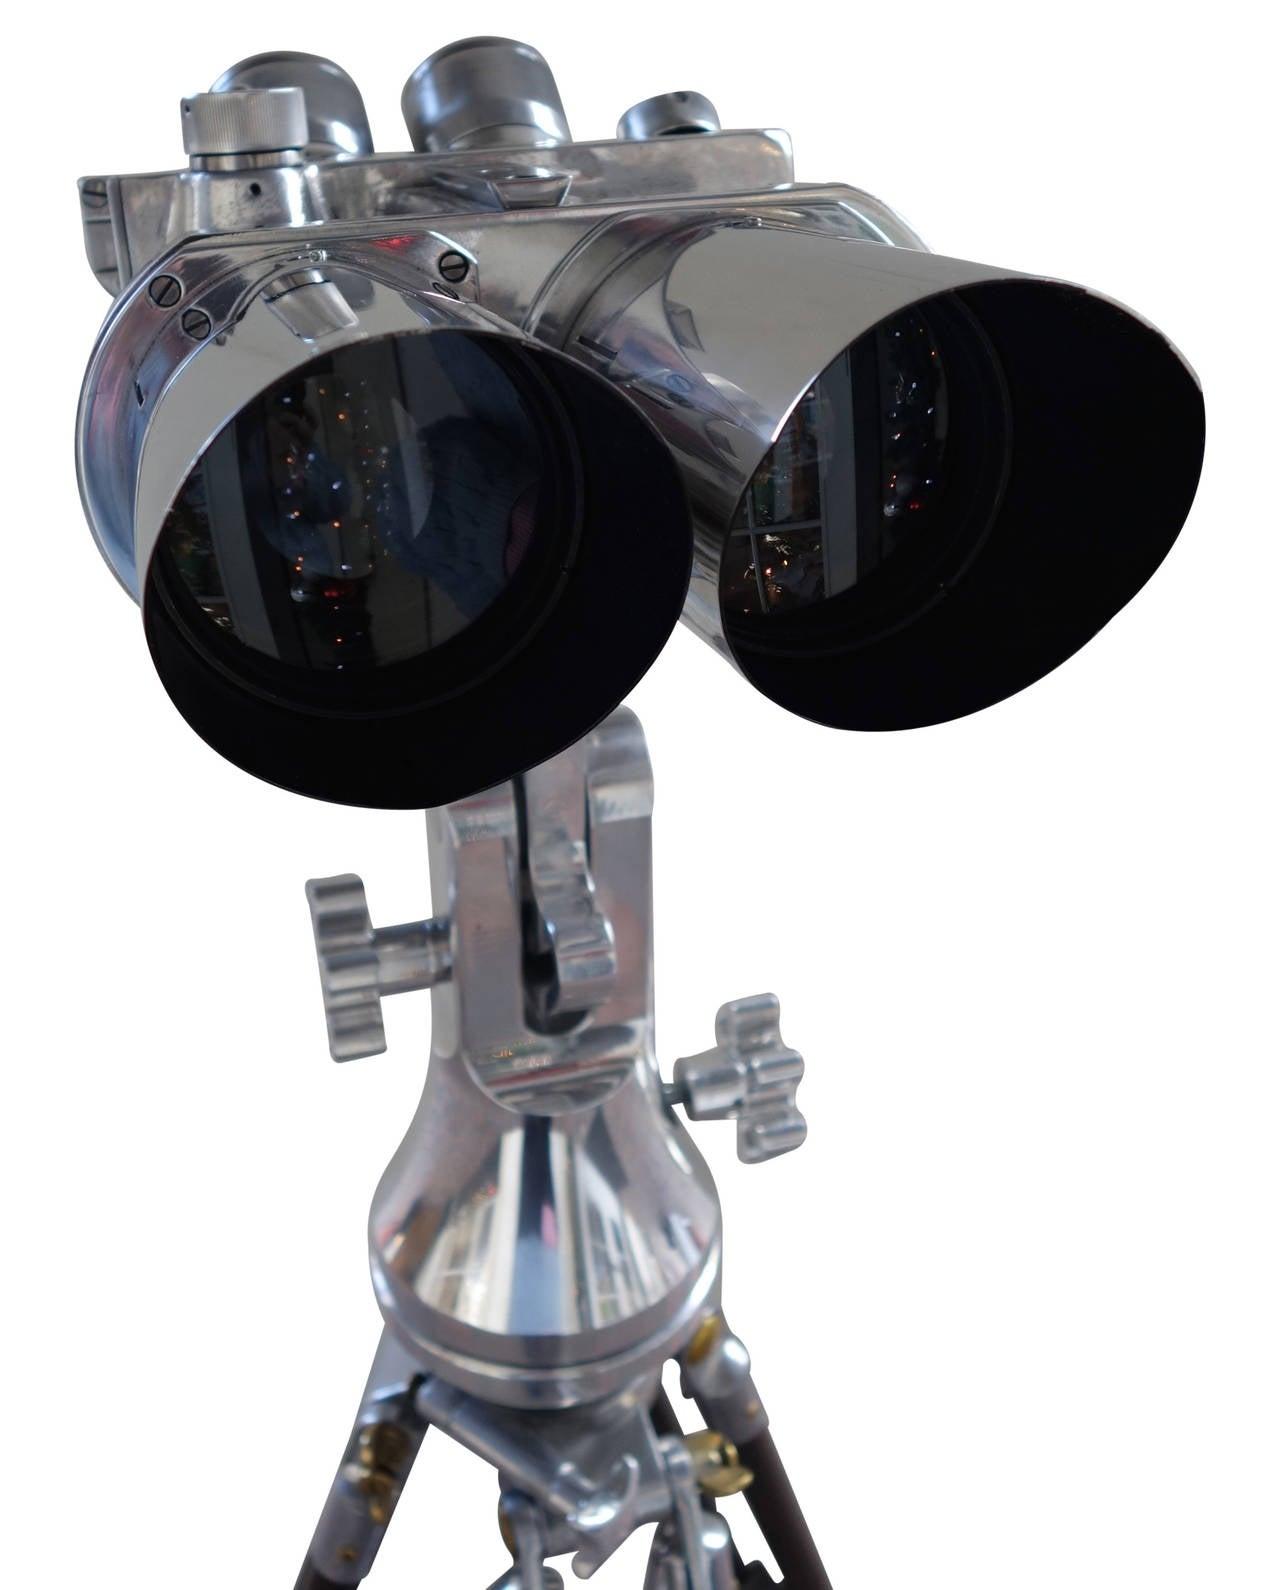 Ww2 Field Binoculars Field Binoculars on Stand